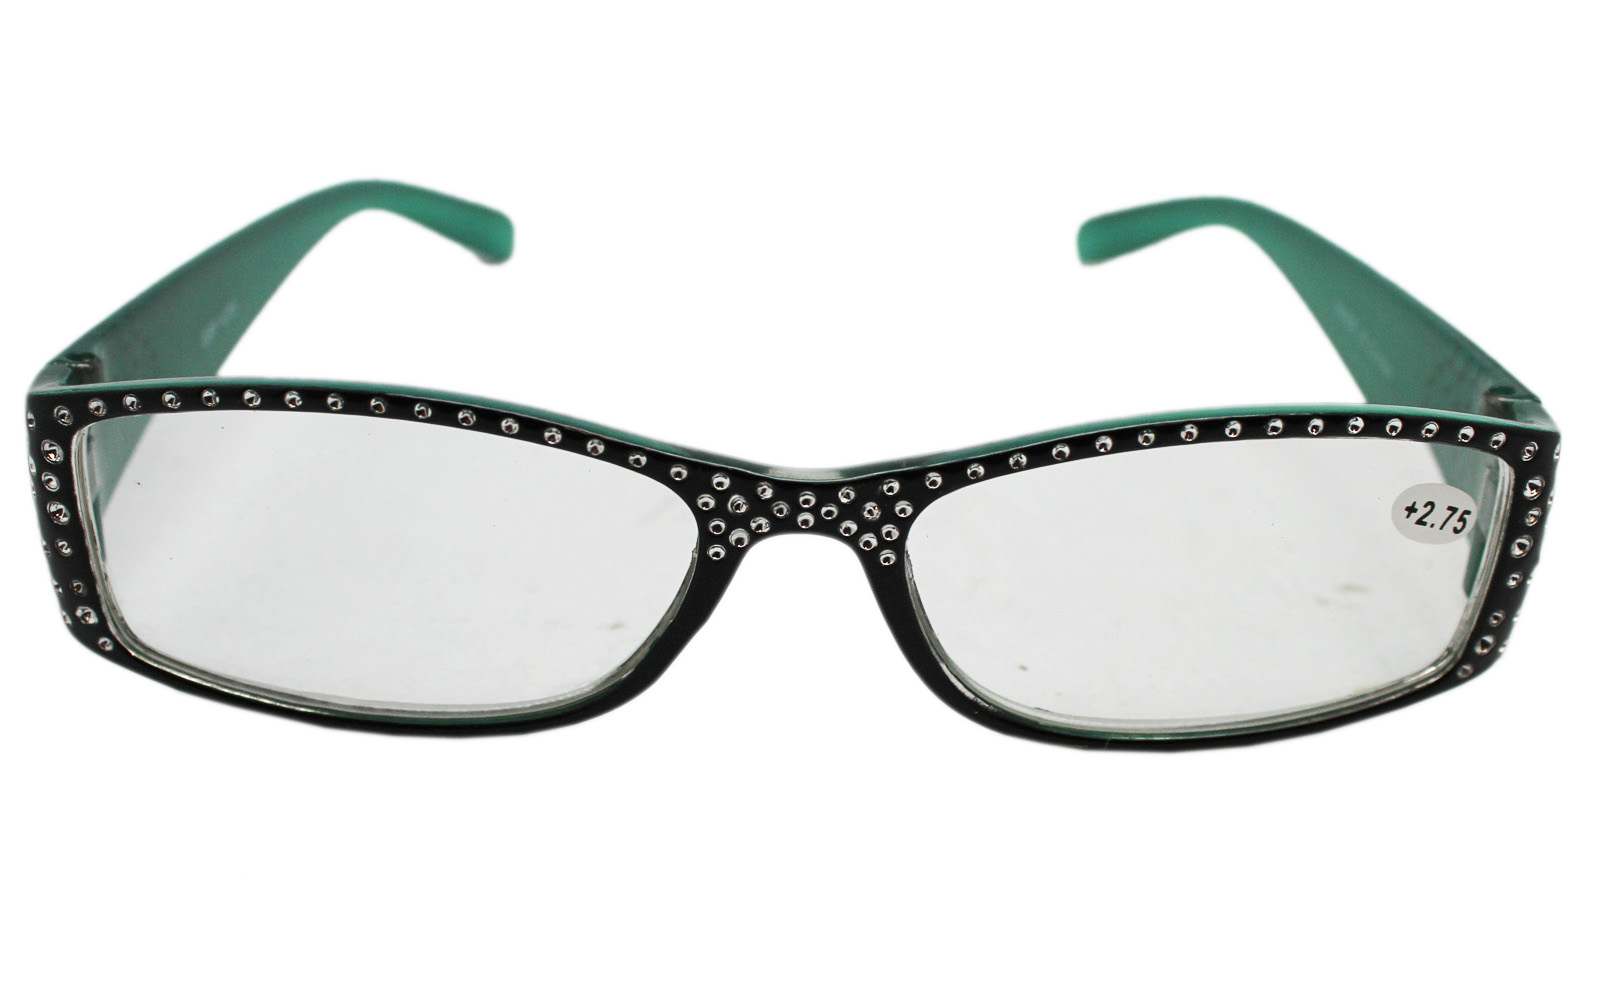 b8390afb127 Black and Teal Framed Reading Glasses w Rhinestone Inlays (+2.75) -  Walmart.com